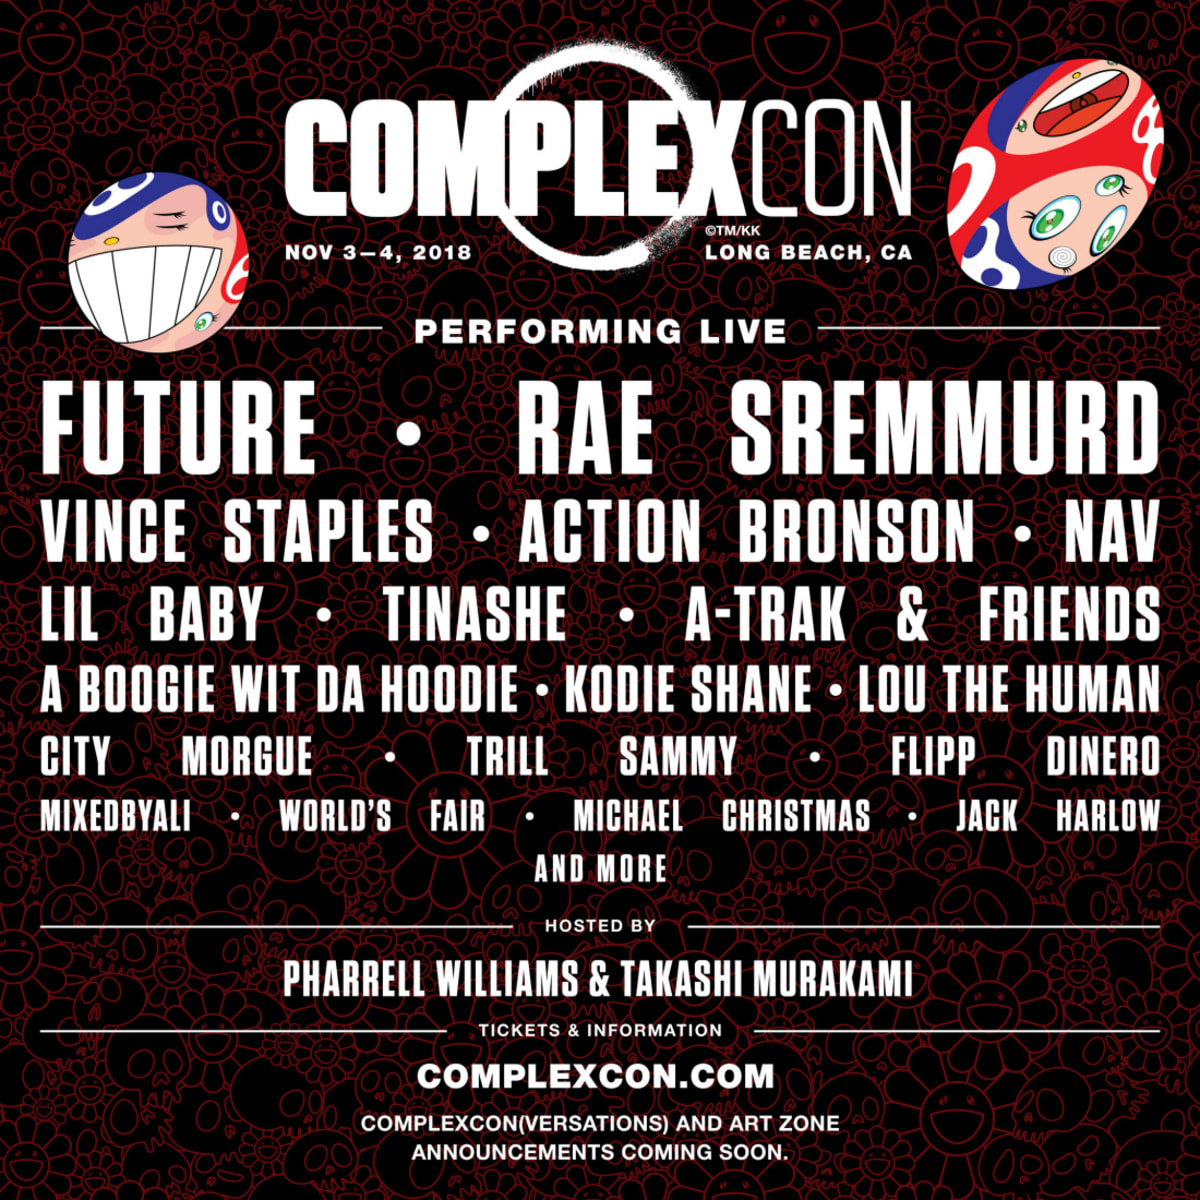 Future Rae Sremmurd Vince Stapleore To Perform At Complexcon 2018 Complex